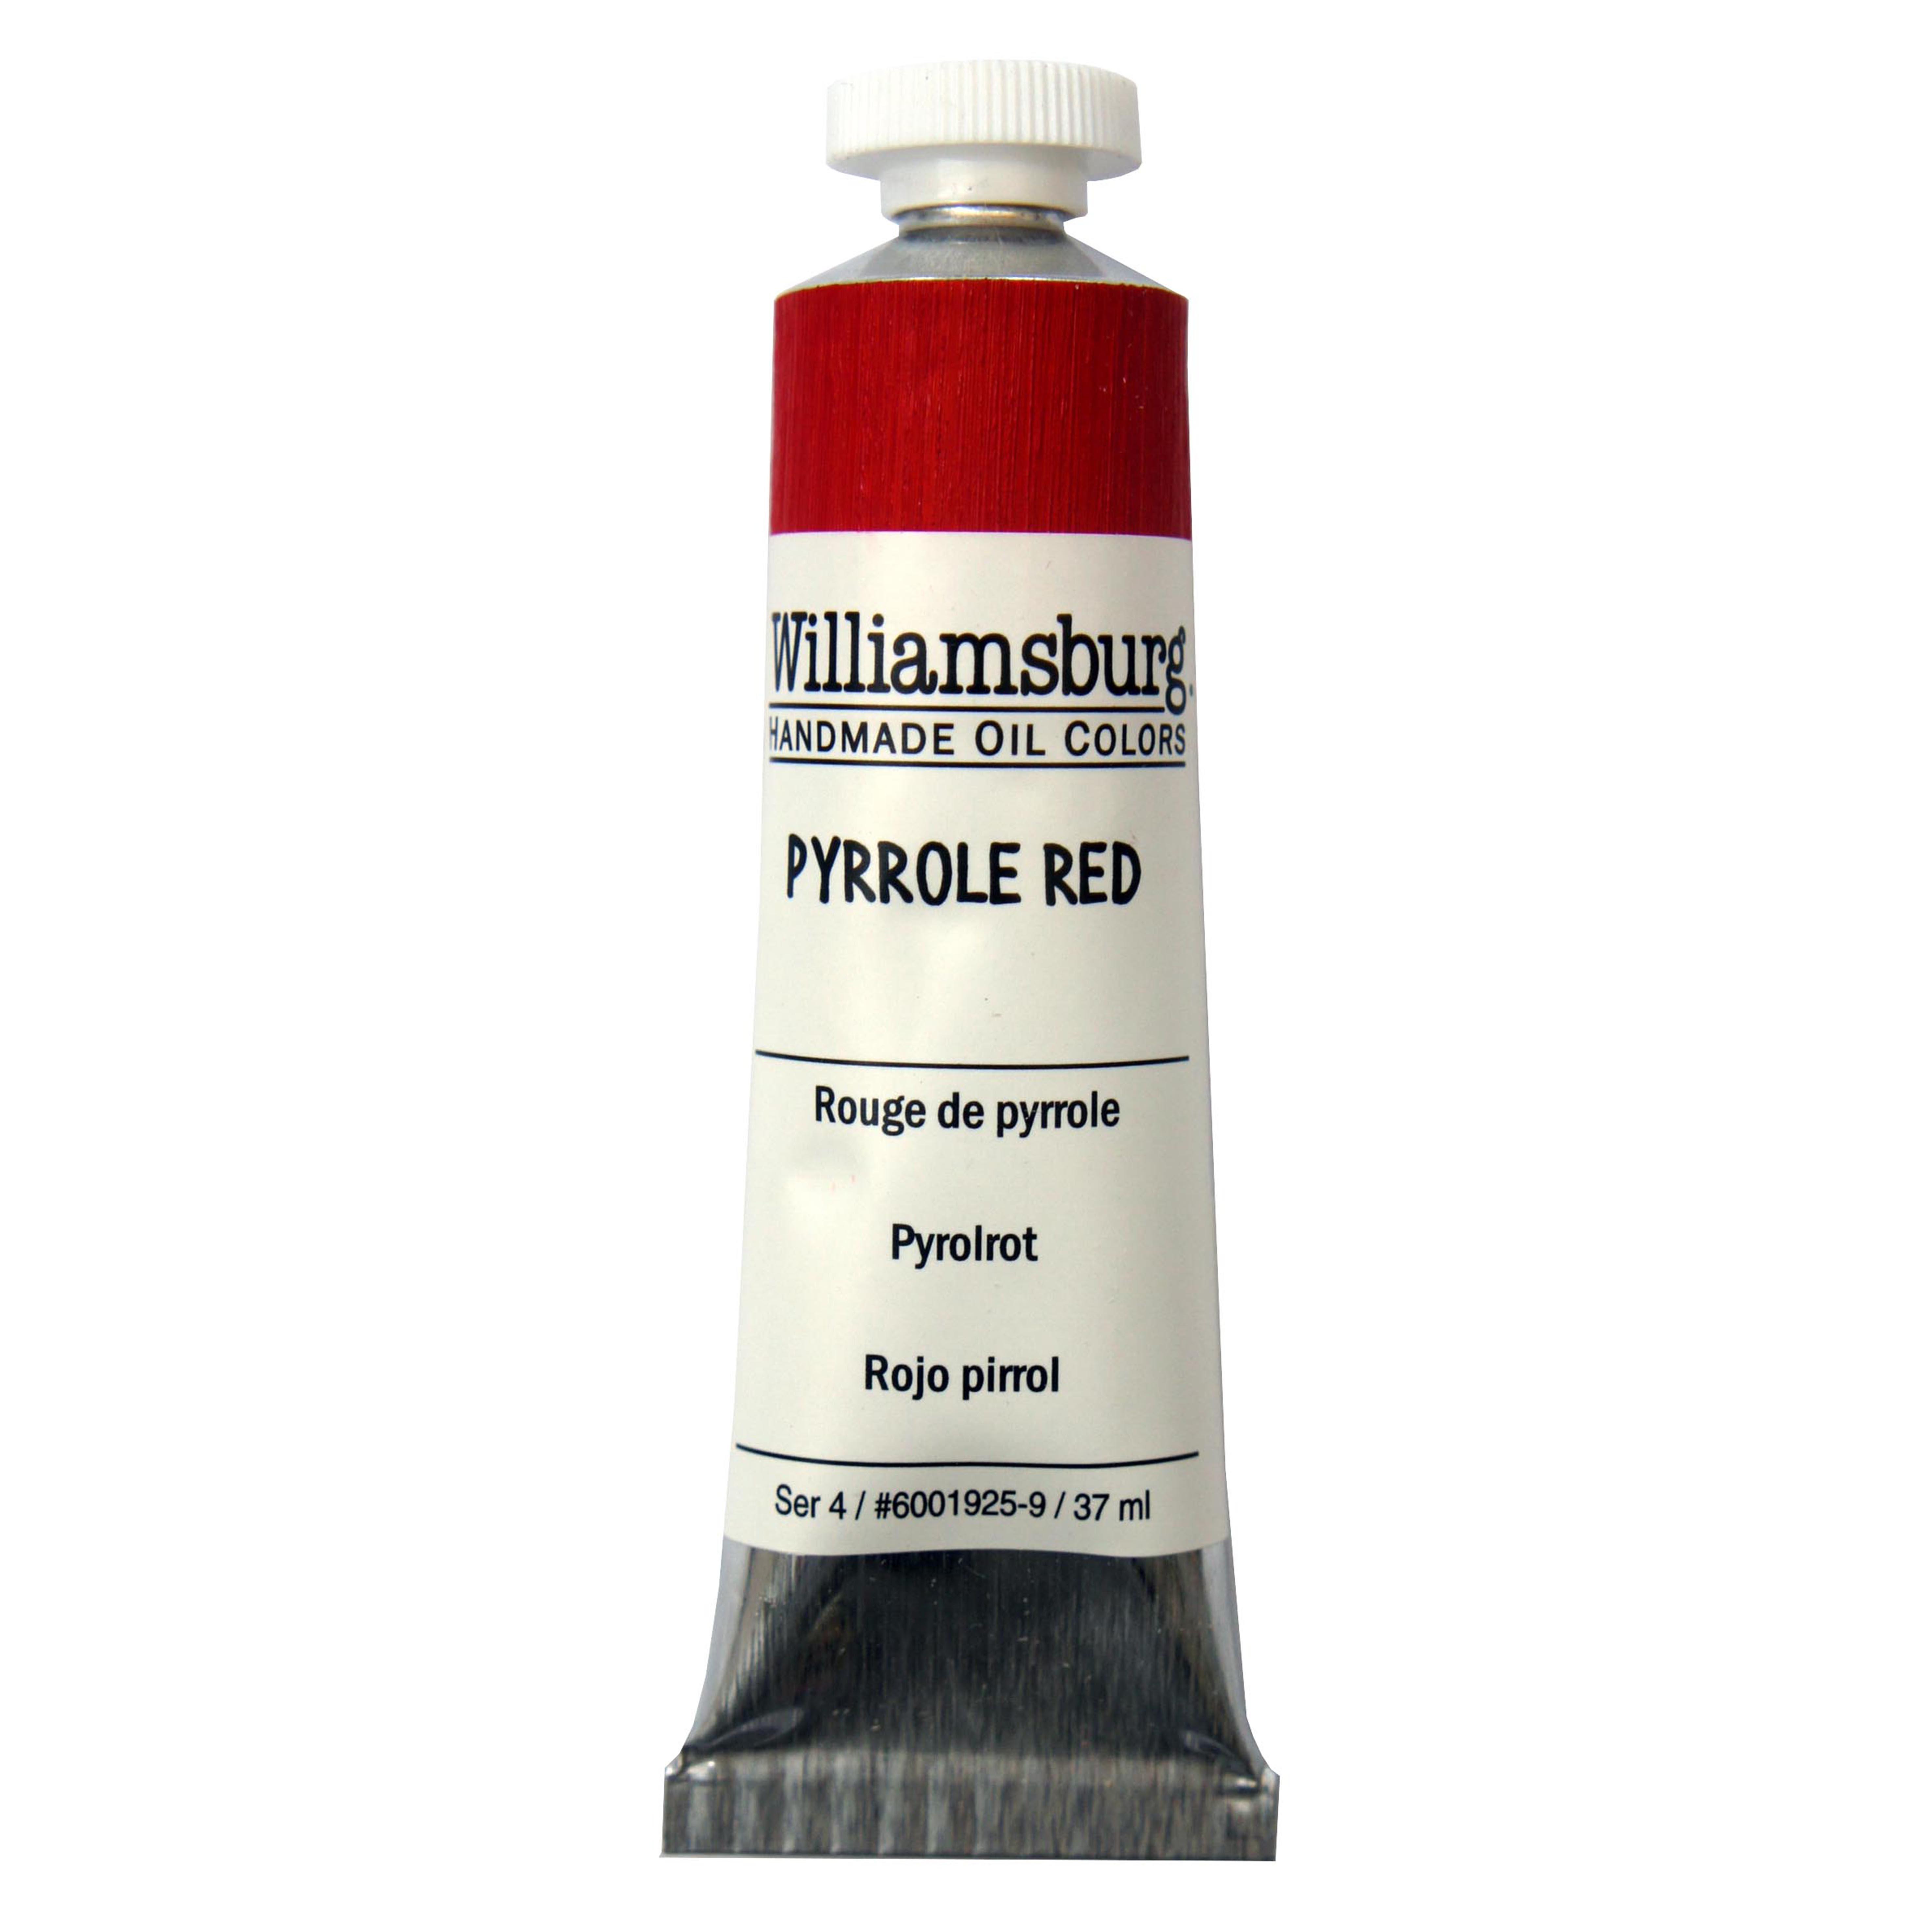 williamsburg pyrrole red london art shop buy art supplies